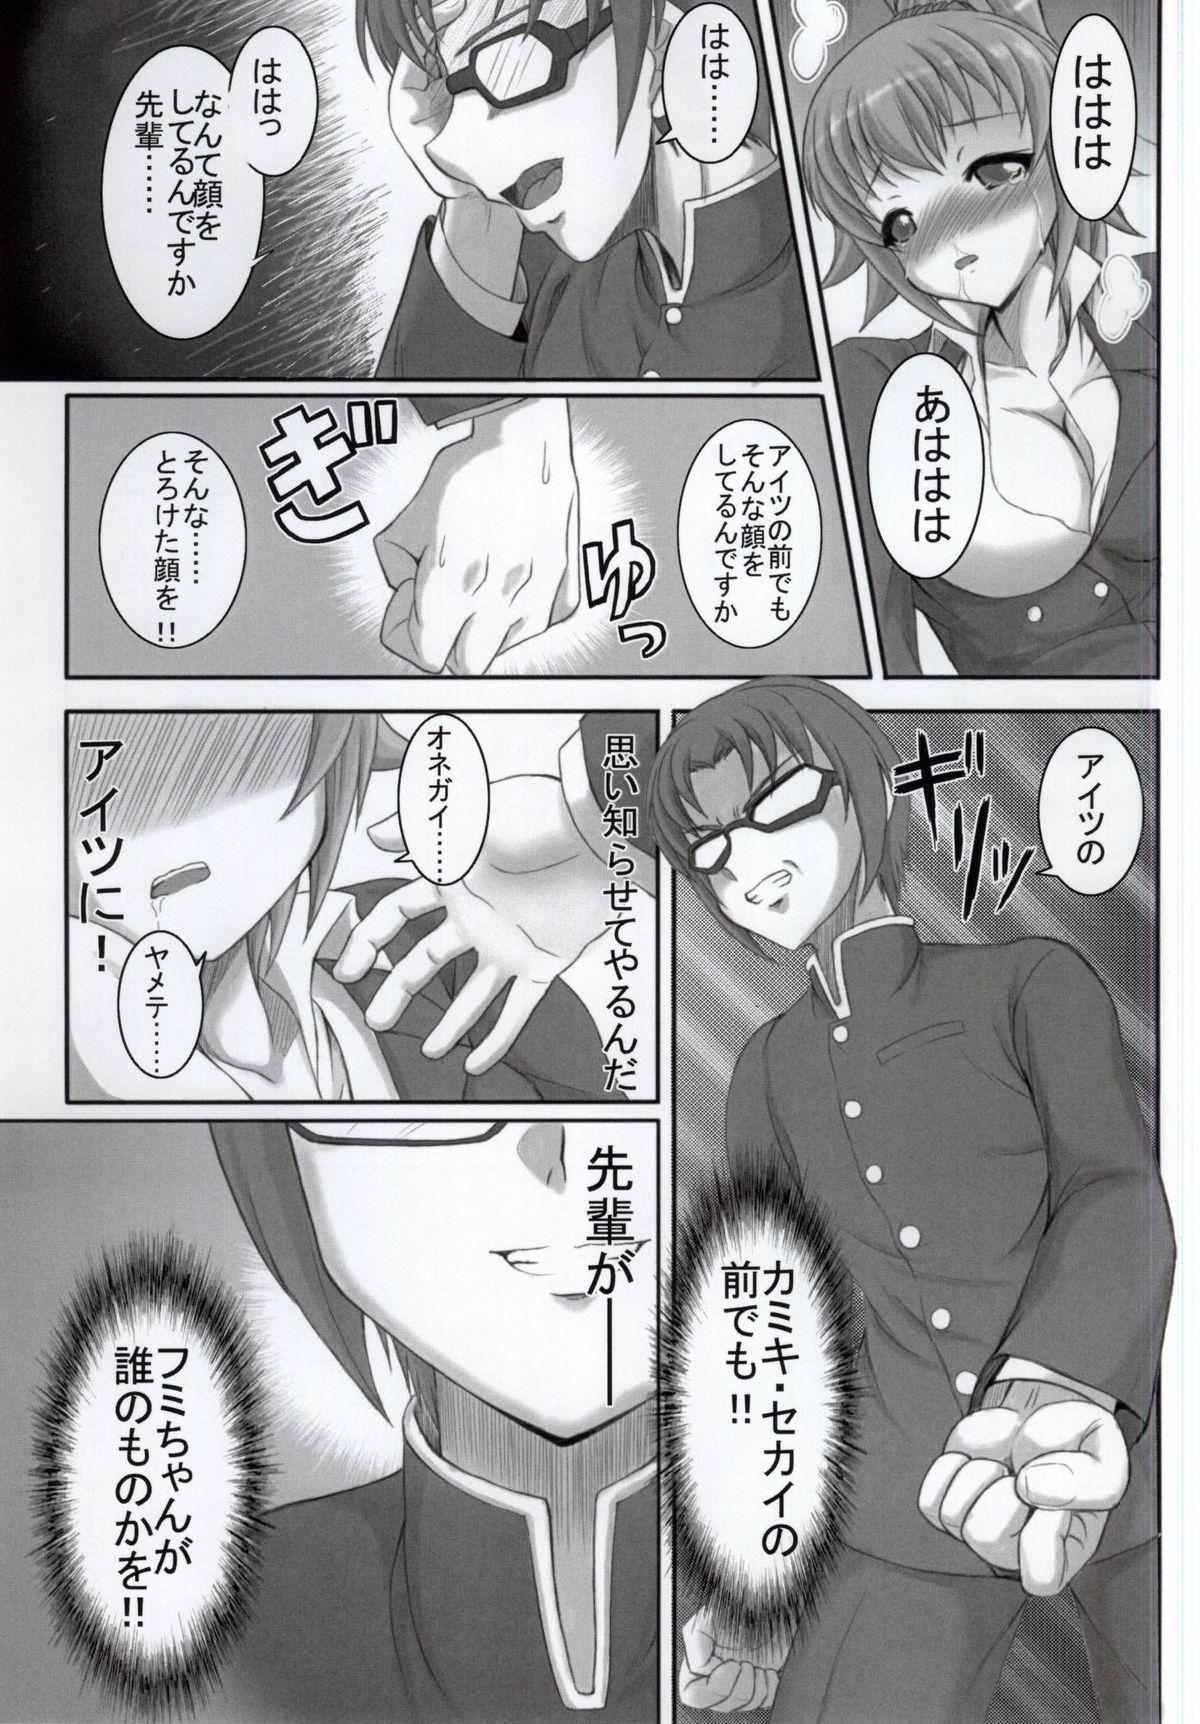 Fumina Senpai no NTR Jijou 4